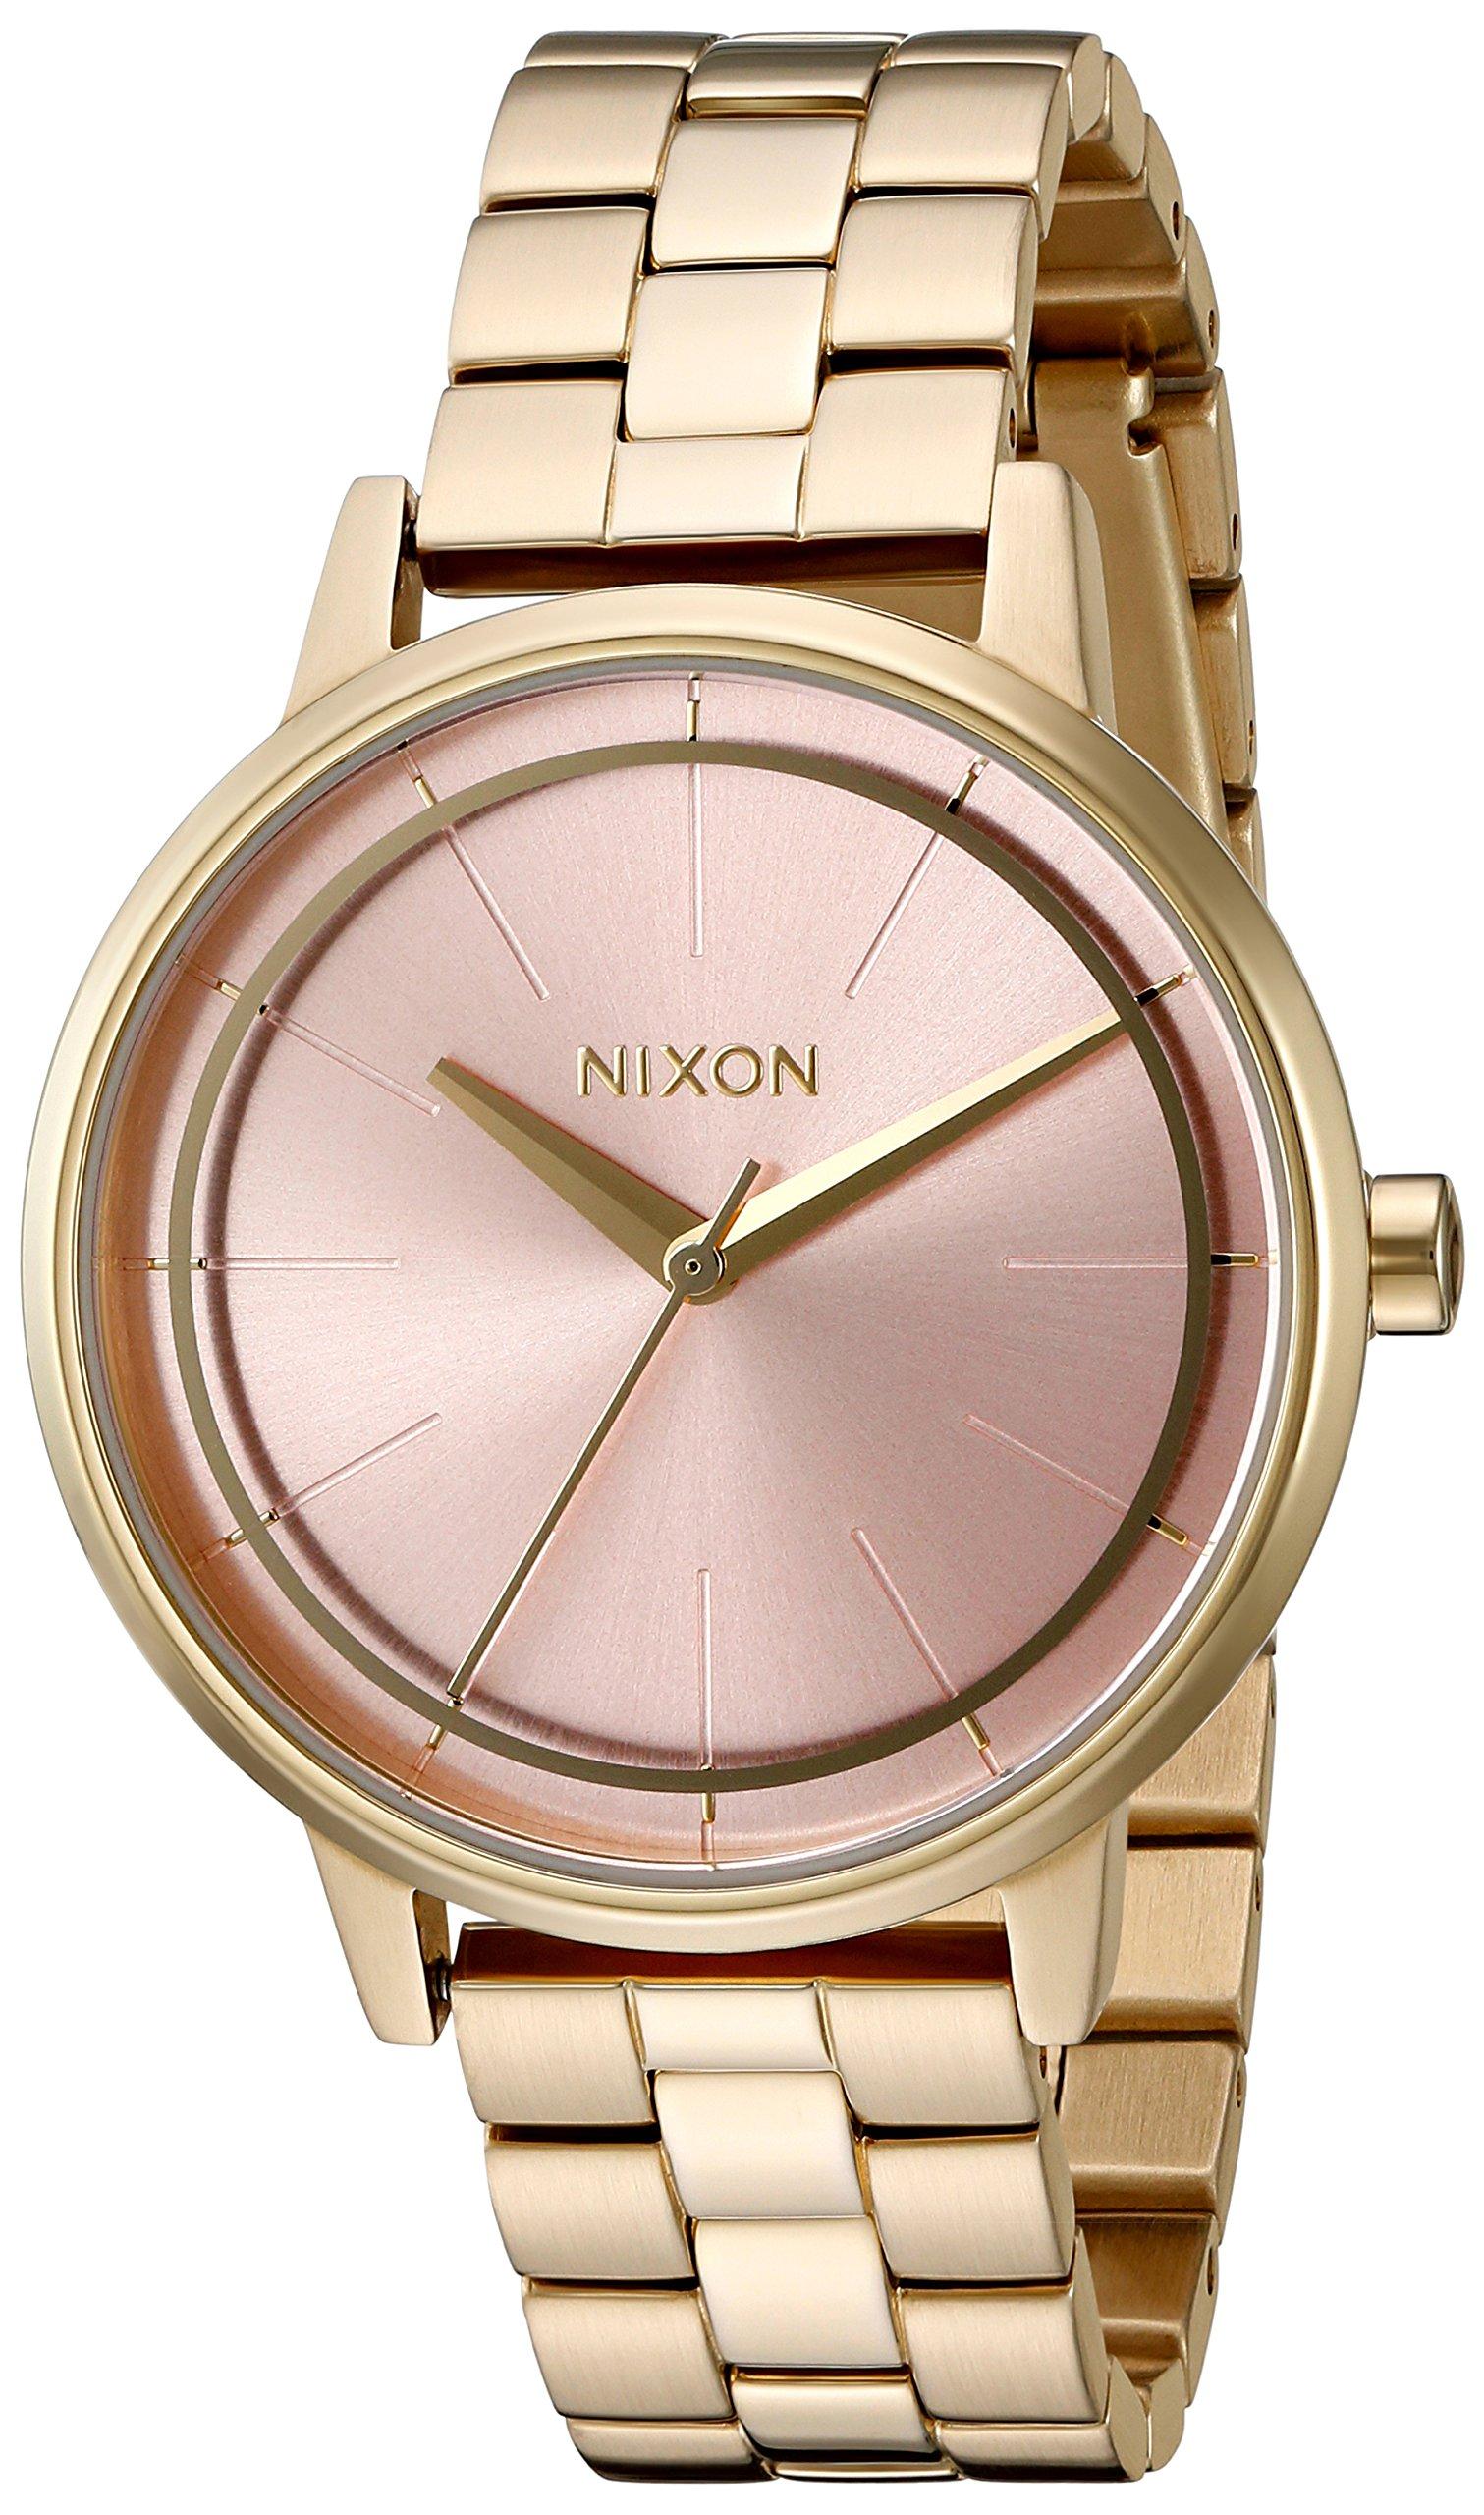 Nixon Women's 'Kensington' Quartz Stainless Steel Watch, Color Gold-Toned (Model: A0992360-00) by NIXON